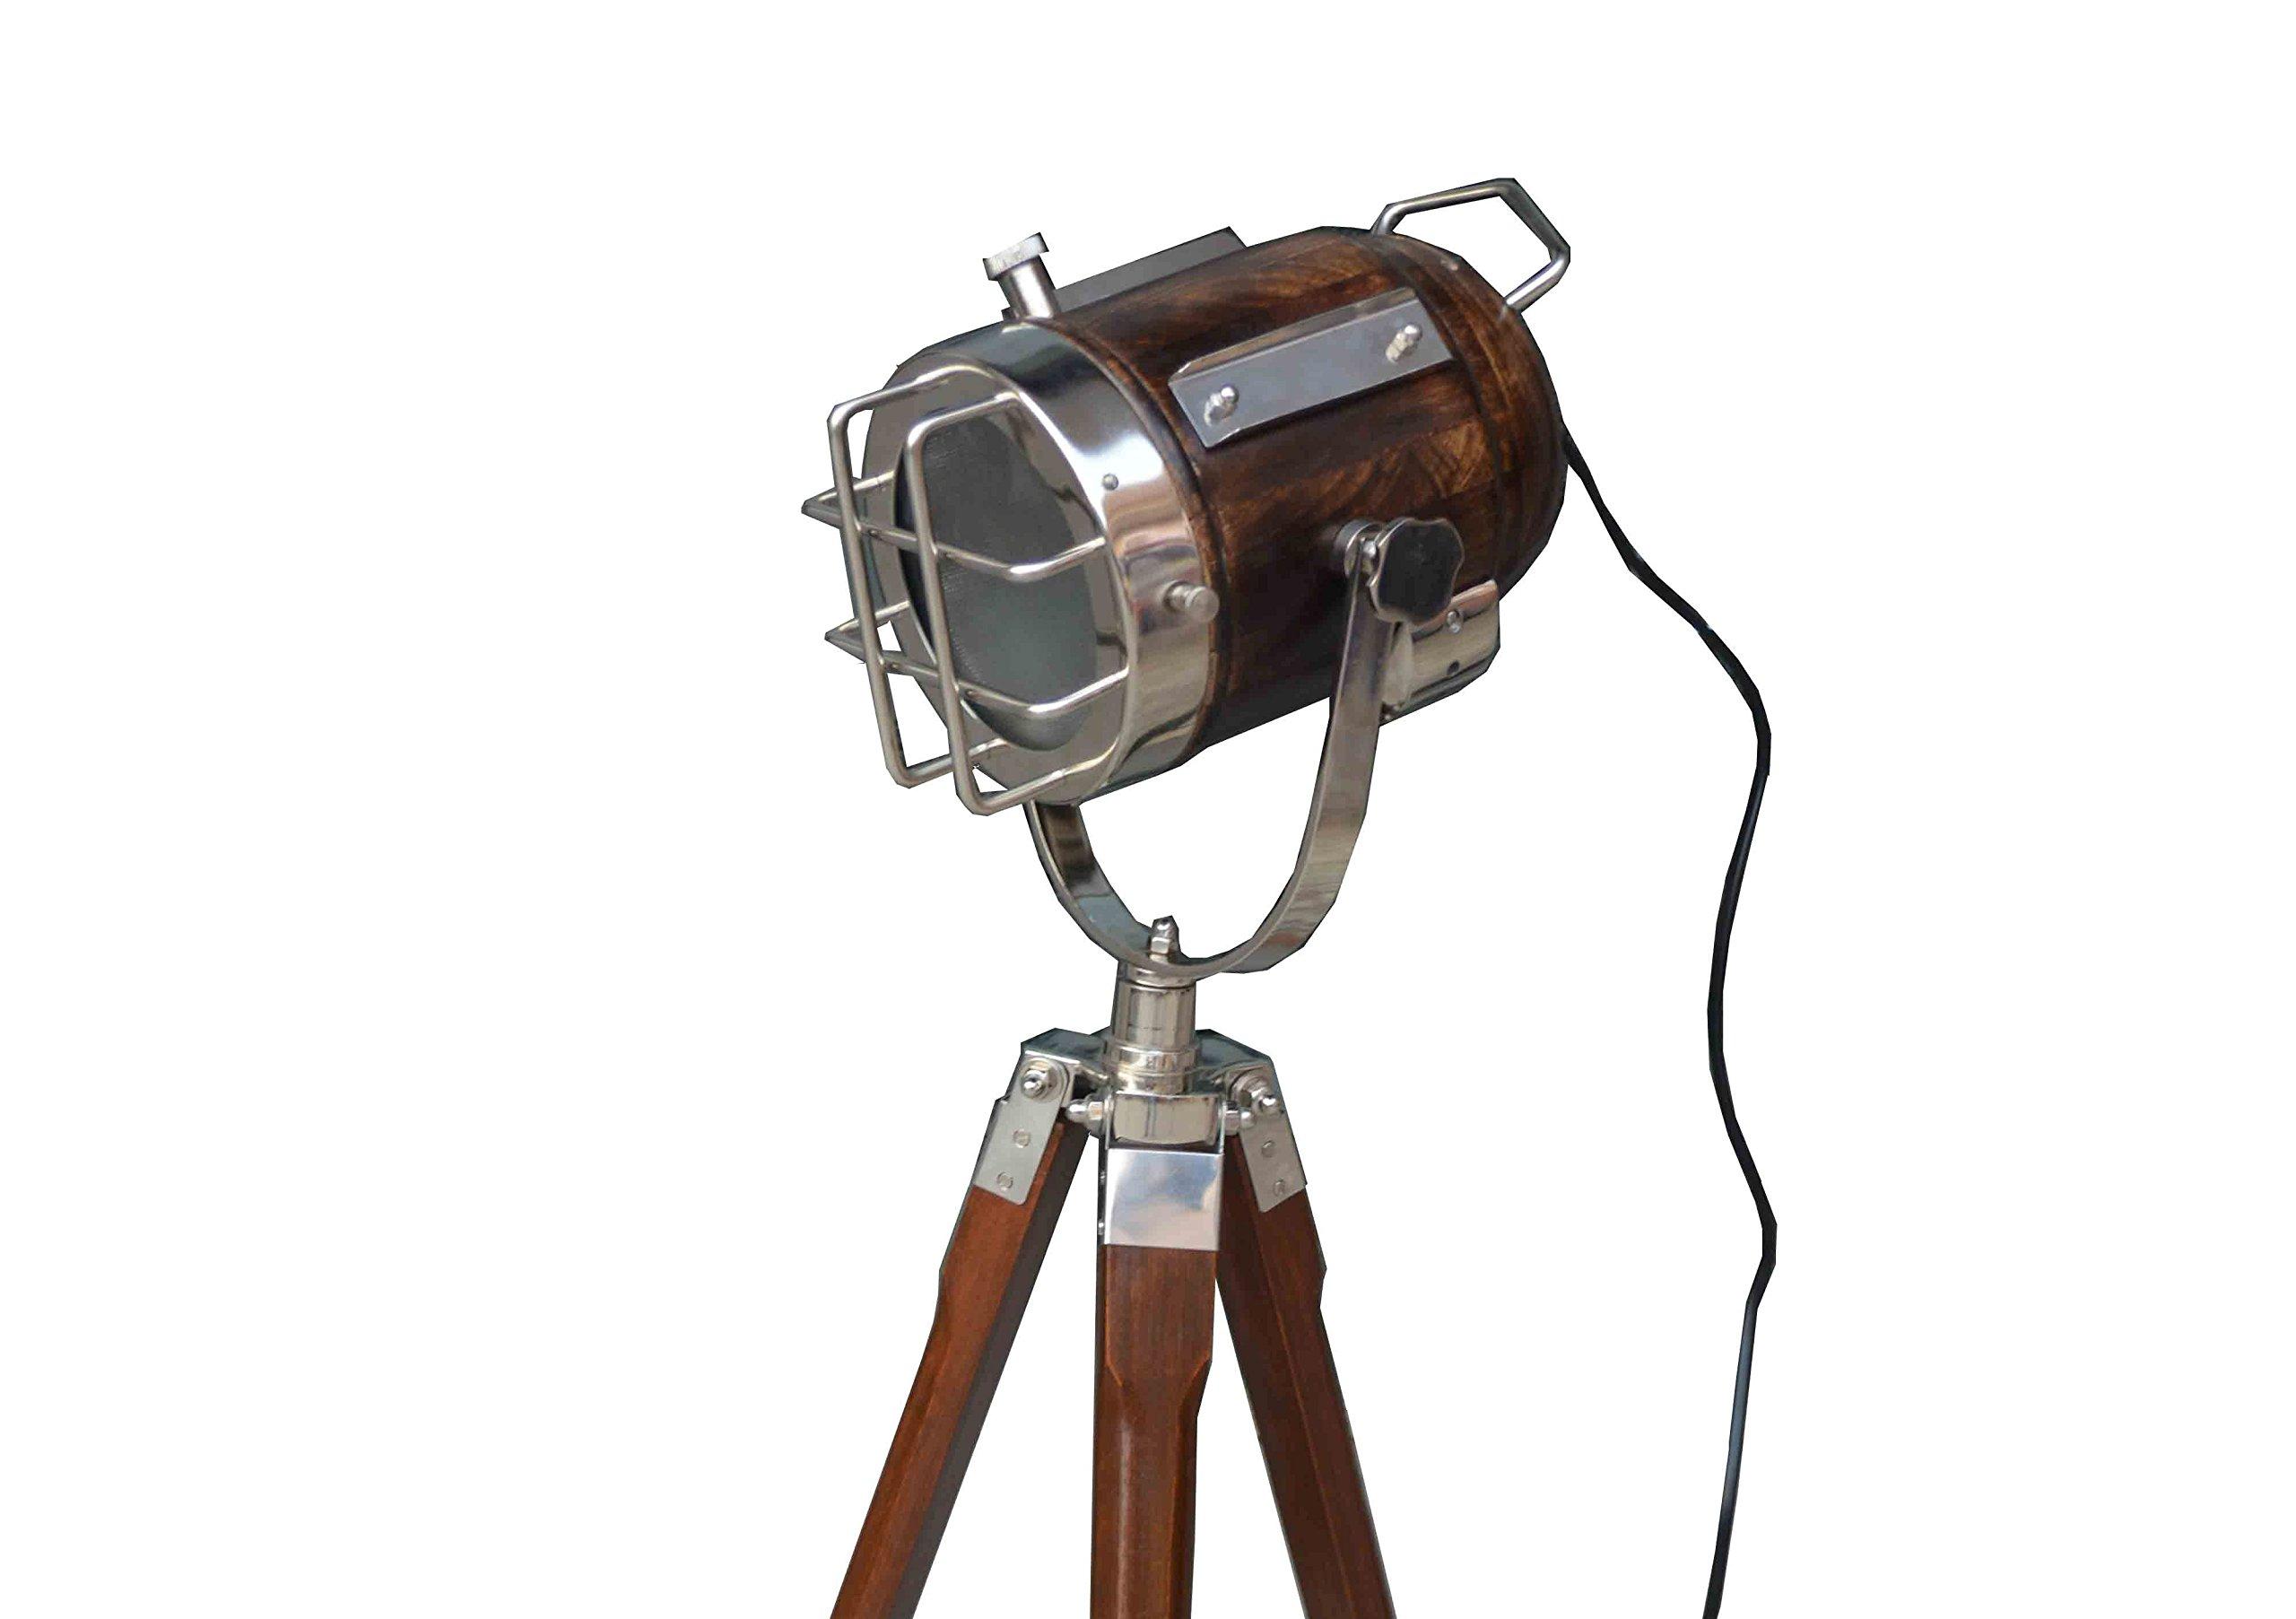 DESIGNER STUDIO FLOOR LAMP TRIPOD SEARCHLIGHT HOME DECOR LIGHT by Nautical India (Image #2)